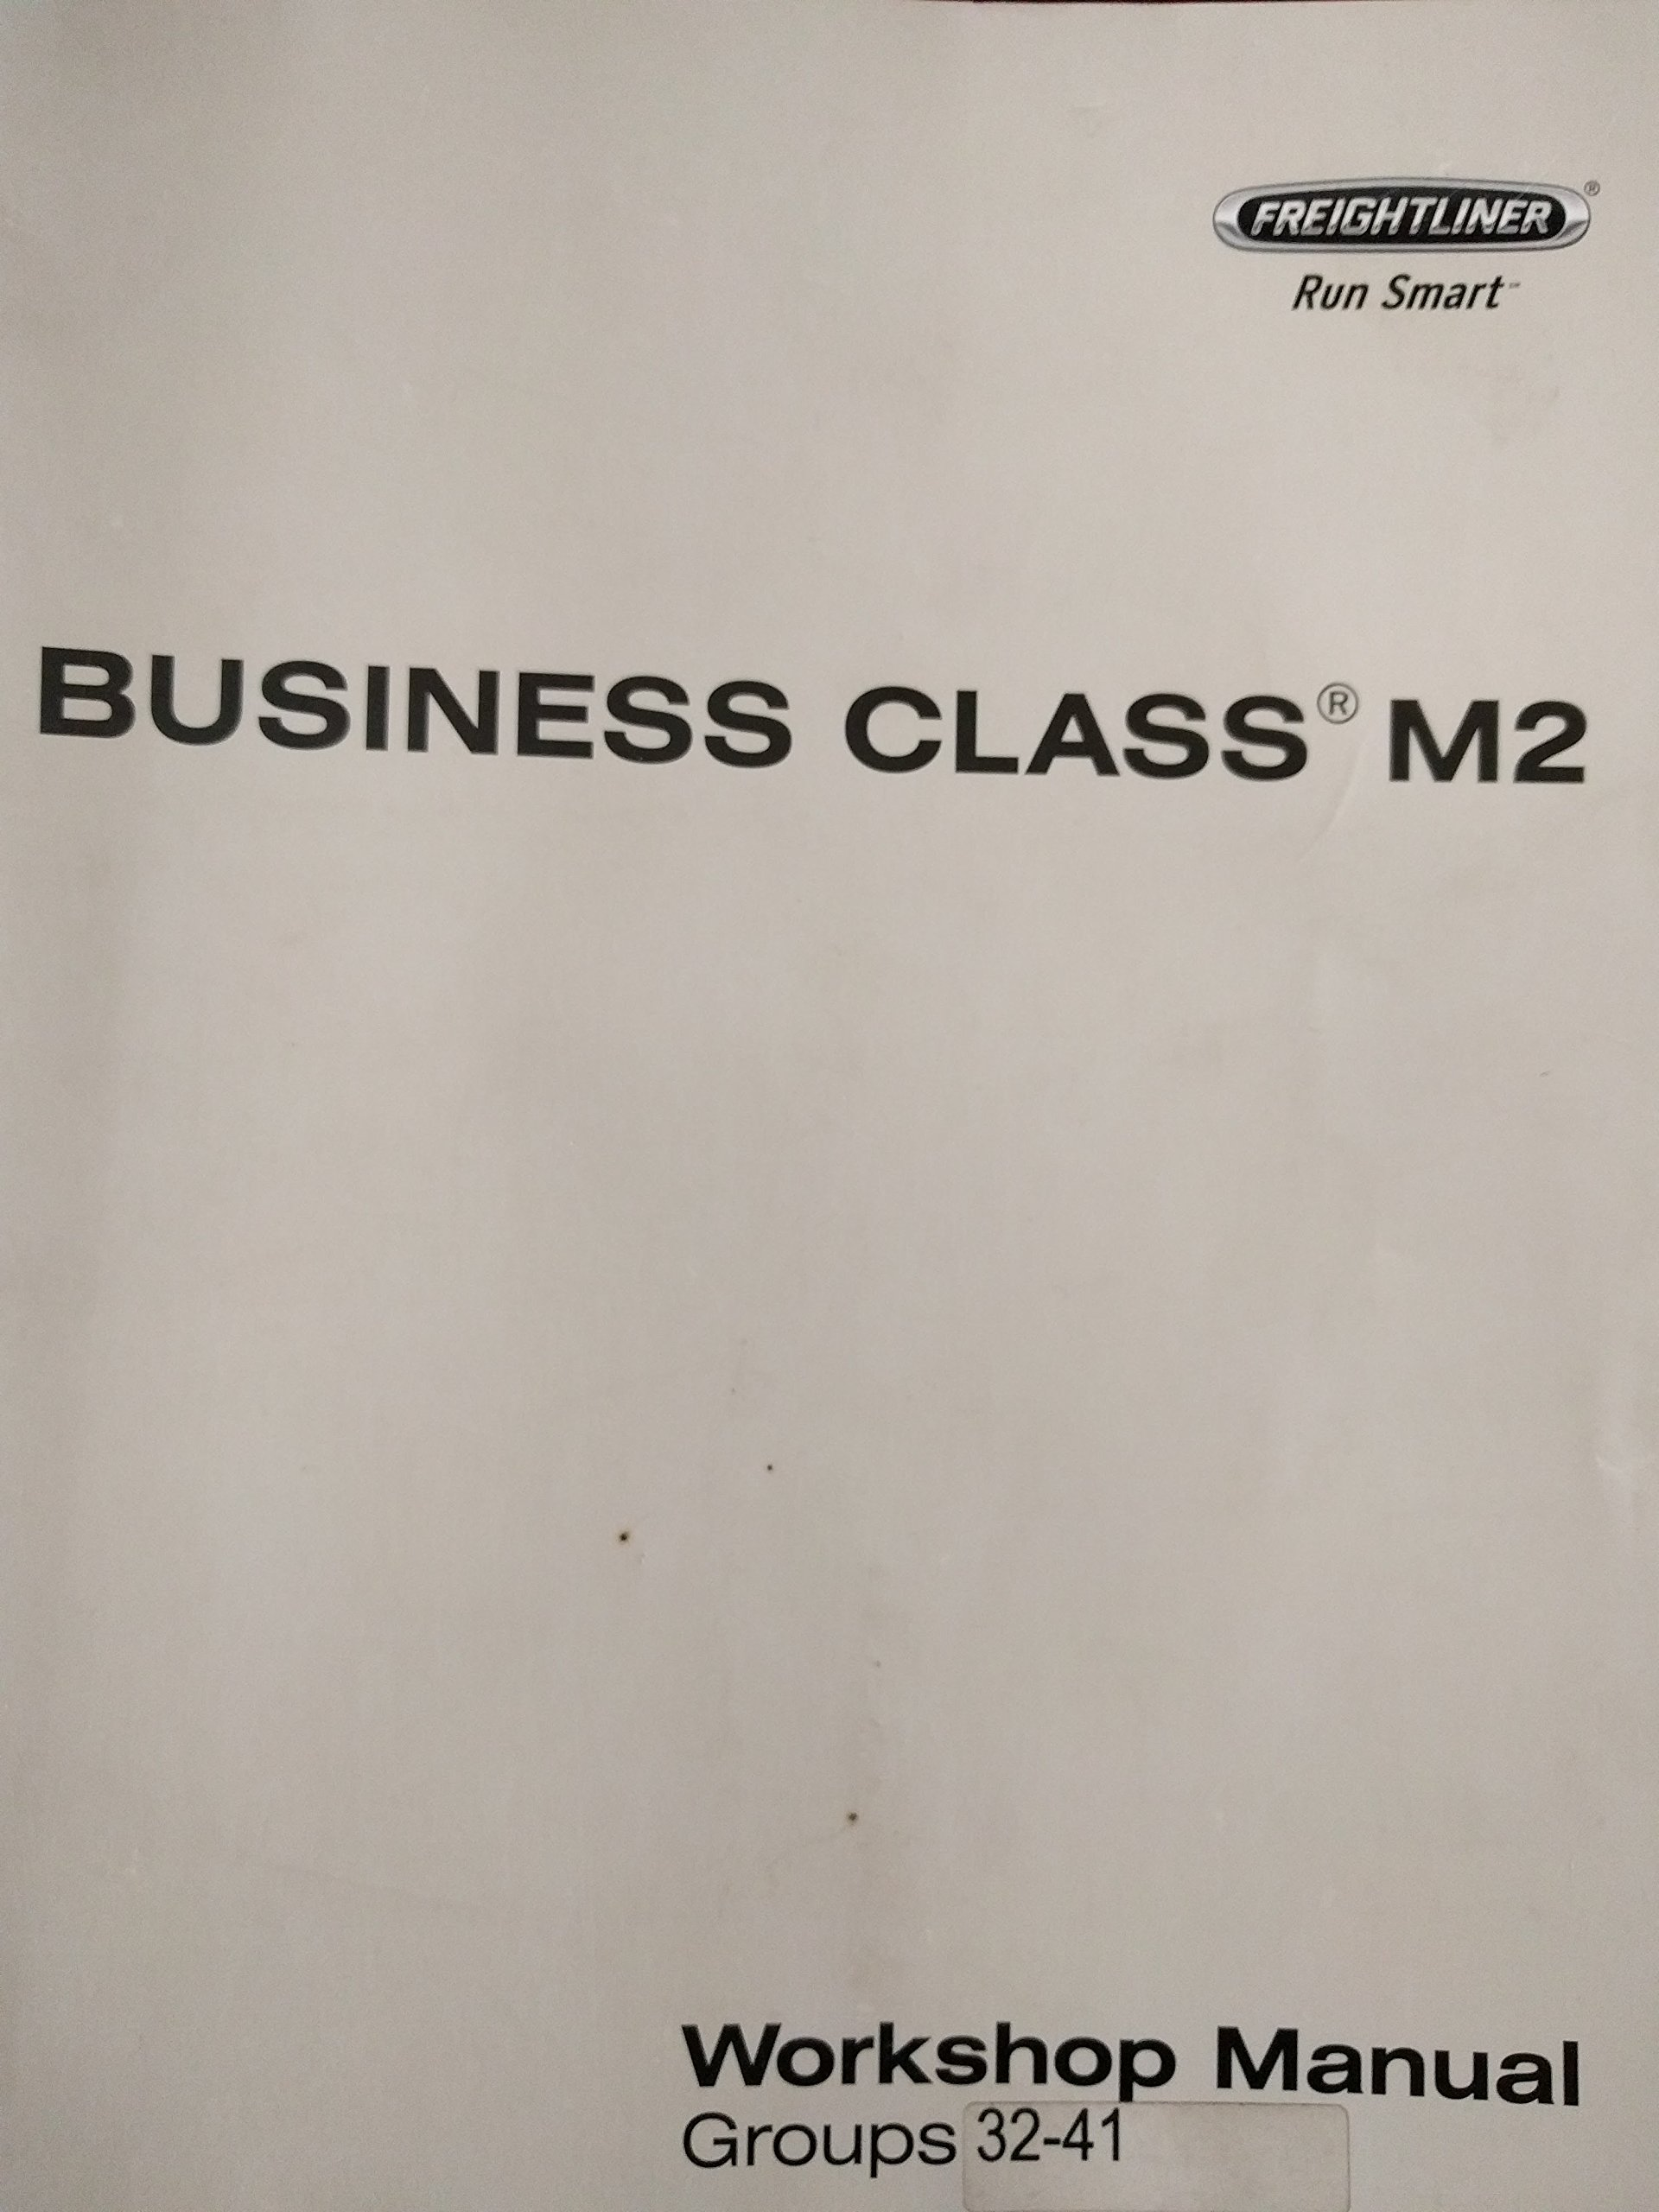 Business Class M2 Workshop Manual - Groups 32-41: Models